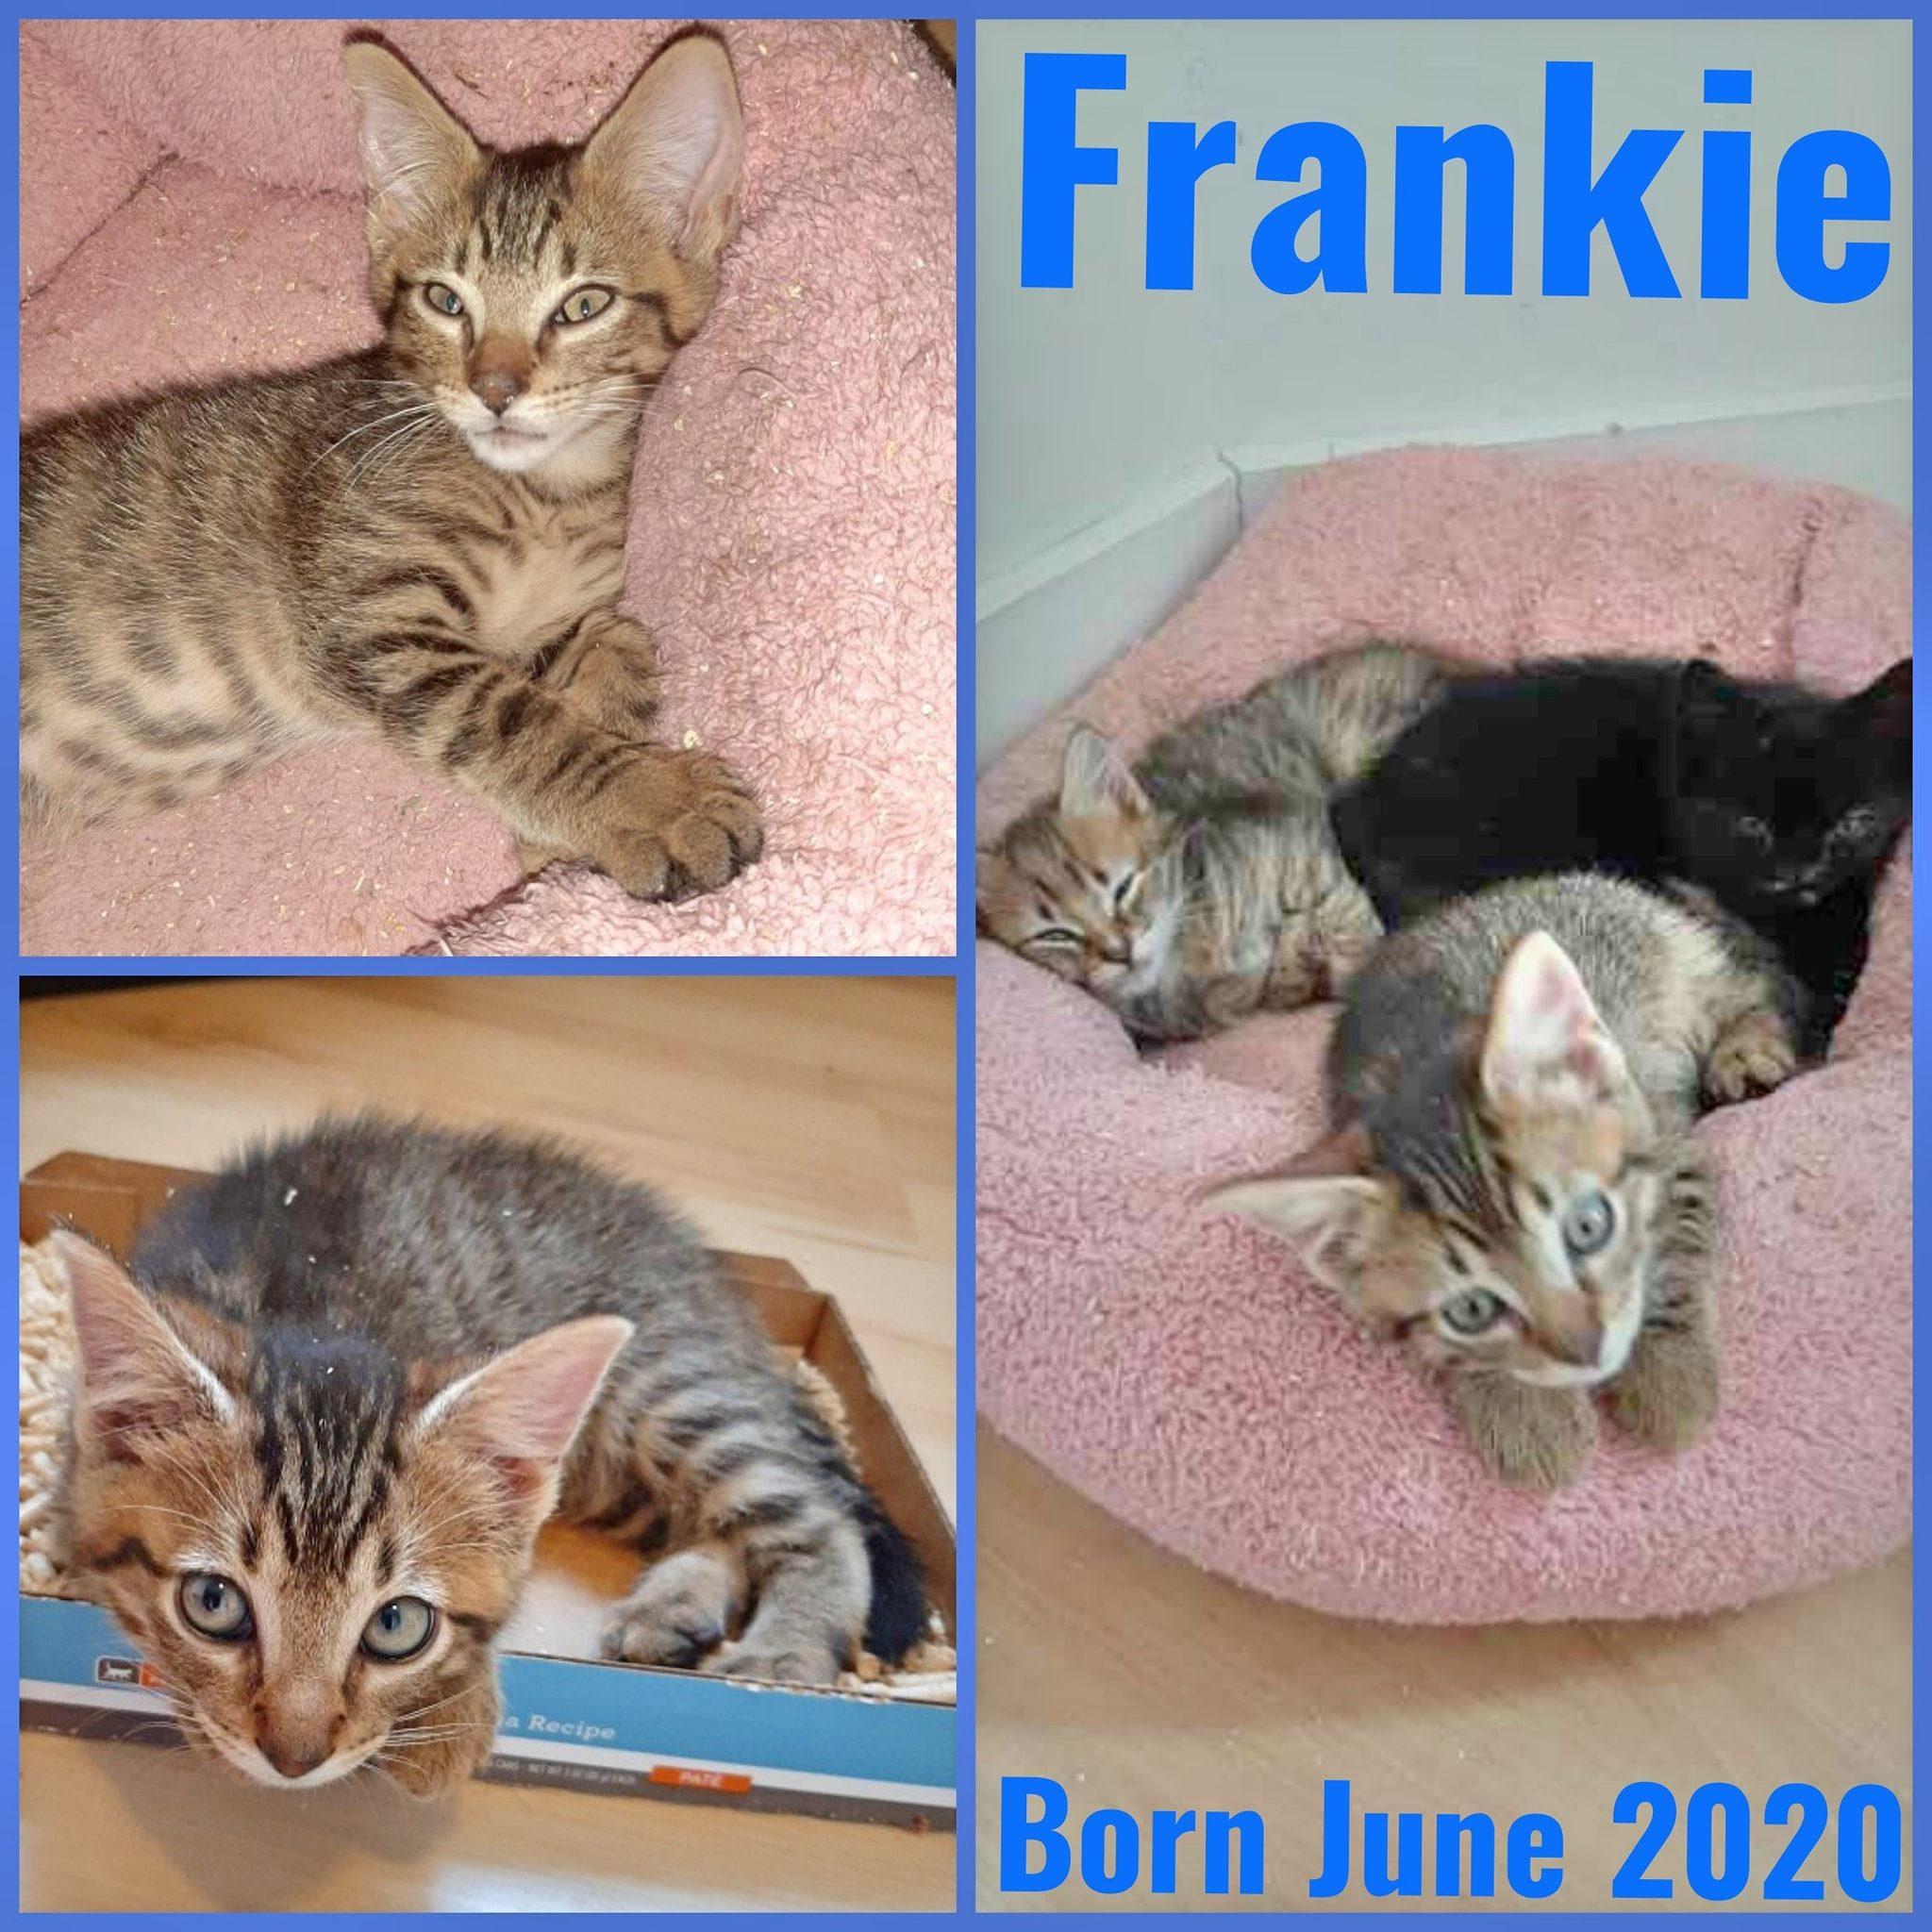 Frankie-Male-Born in June 2020